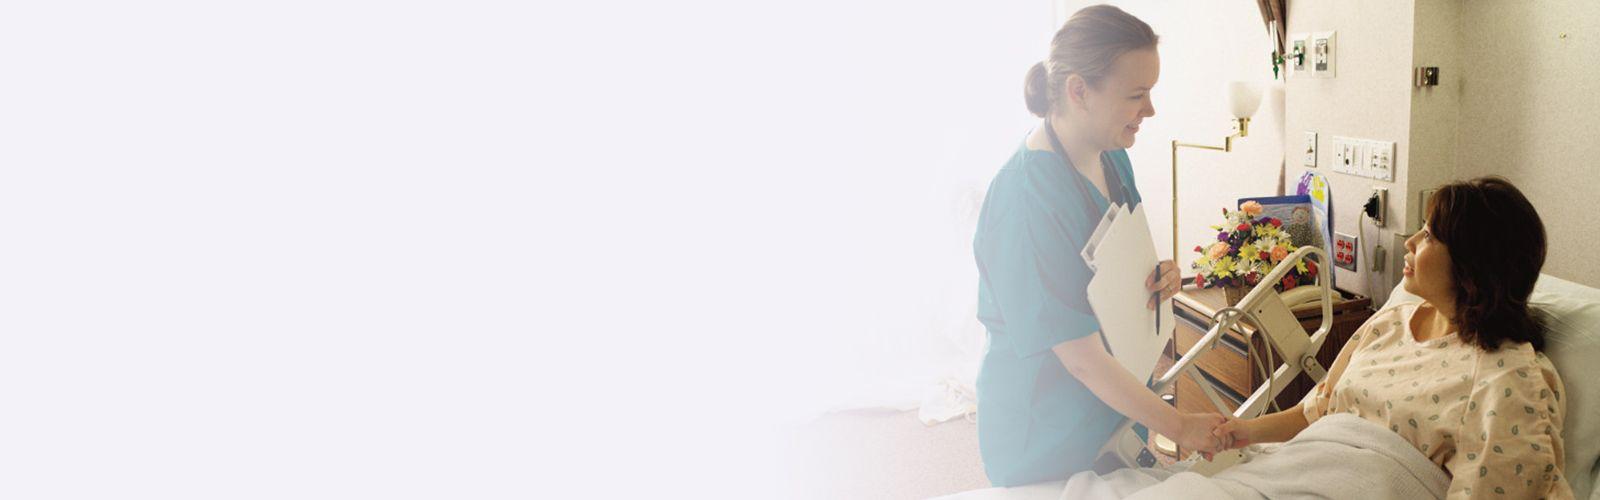 doctor visiting patient at bedside, holding hands